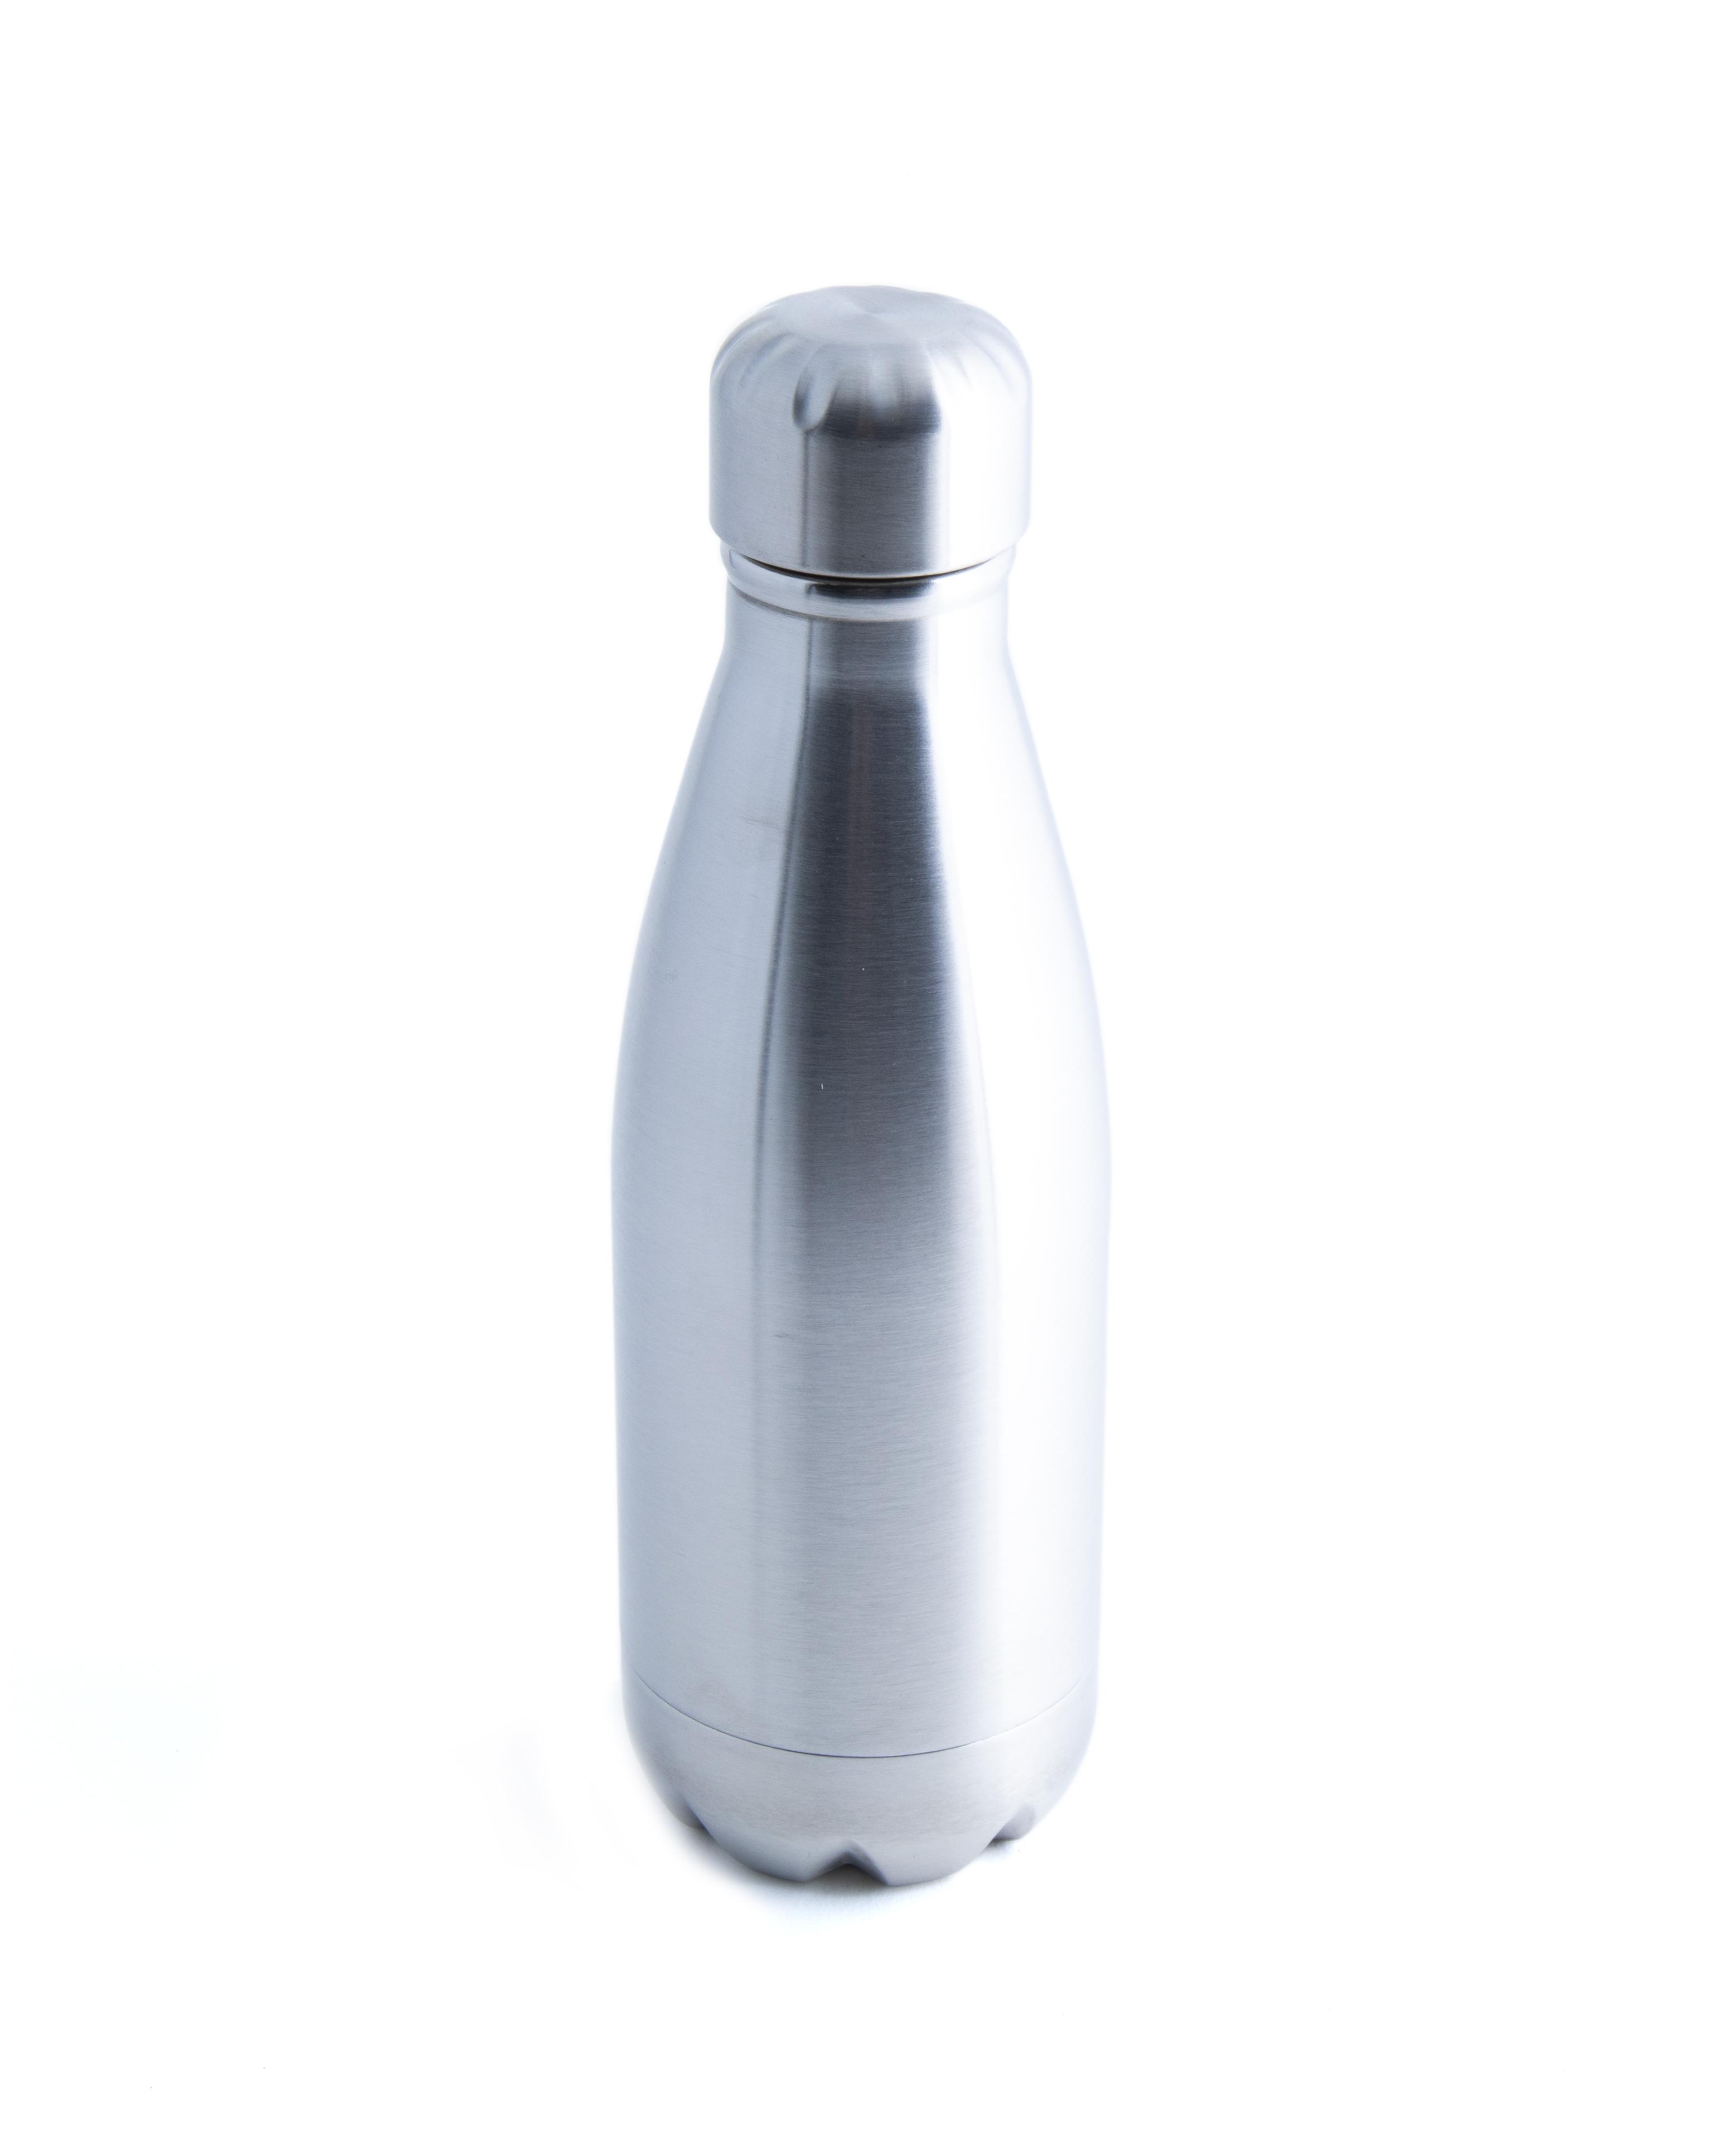 350ml Stainless Steel Water Bottle